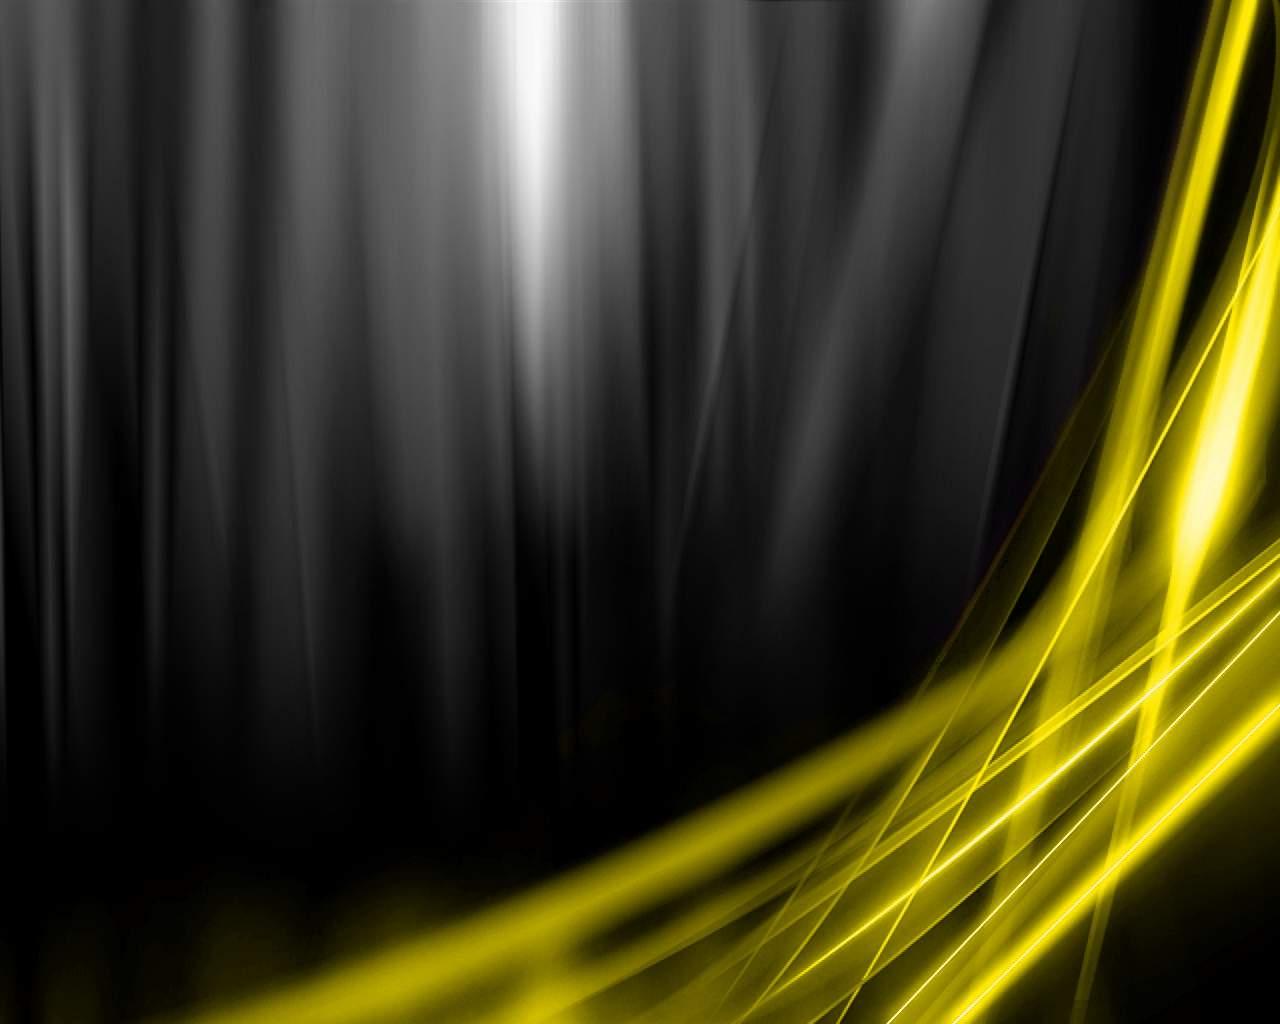 http://3.bp.blogspot.com/-wDd-VqRGdOU/UGgz2HYT6RI/AAAAAAAAAgg/L-PK945bA8c/s1600/Windows-Black-and-Yellow-hd-background-image-wallpaper.jpg